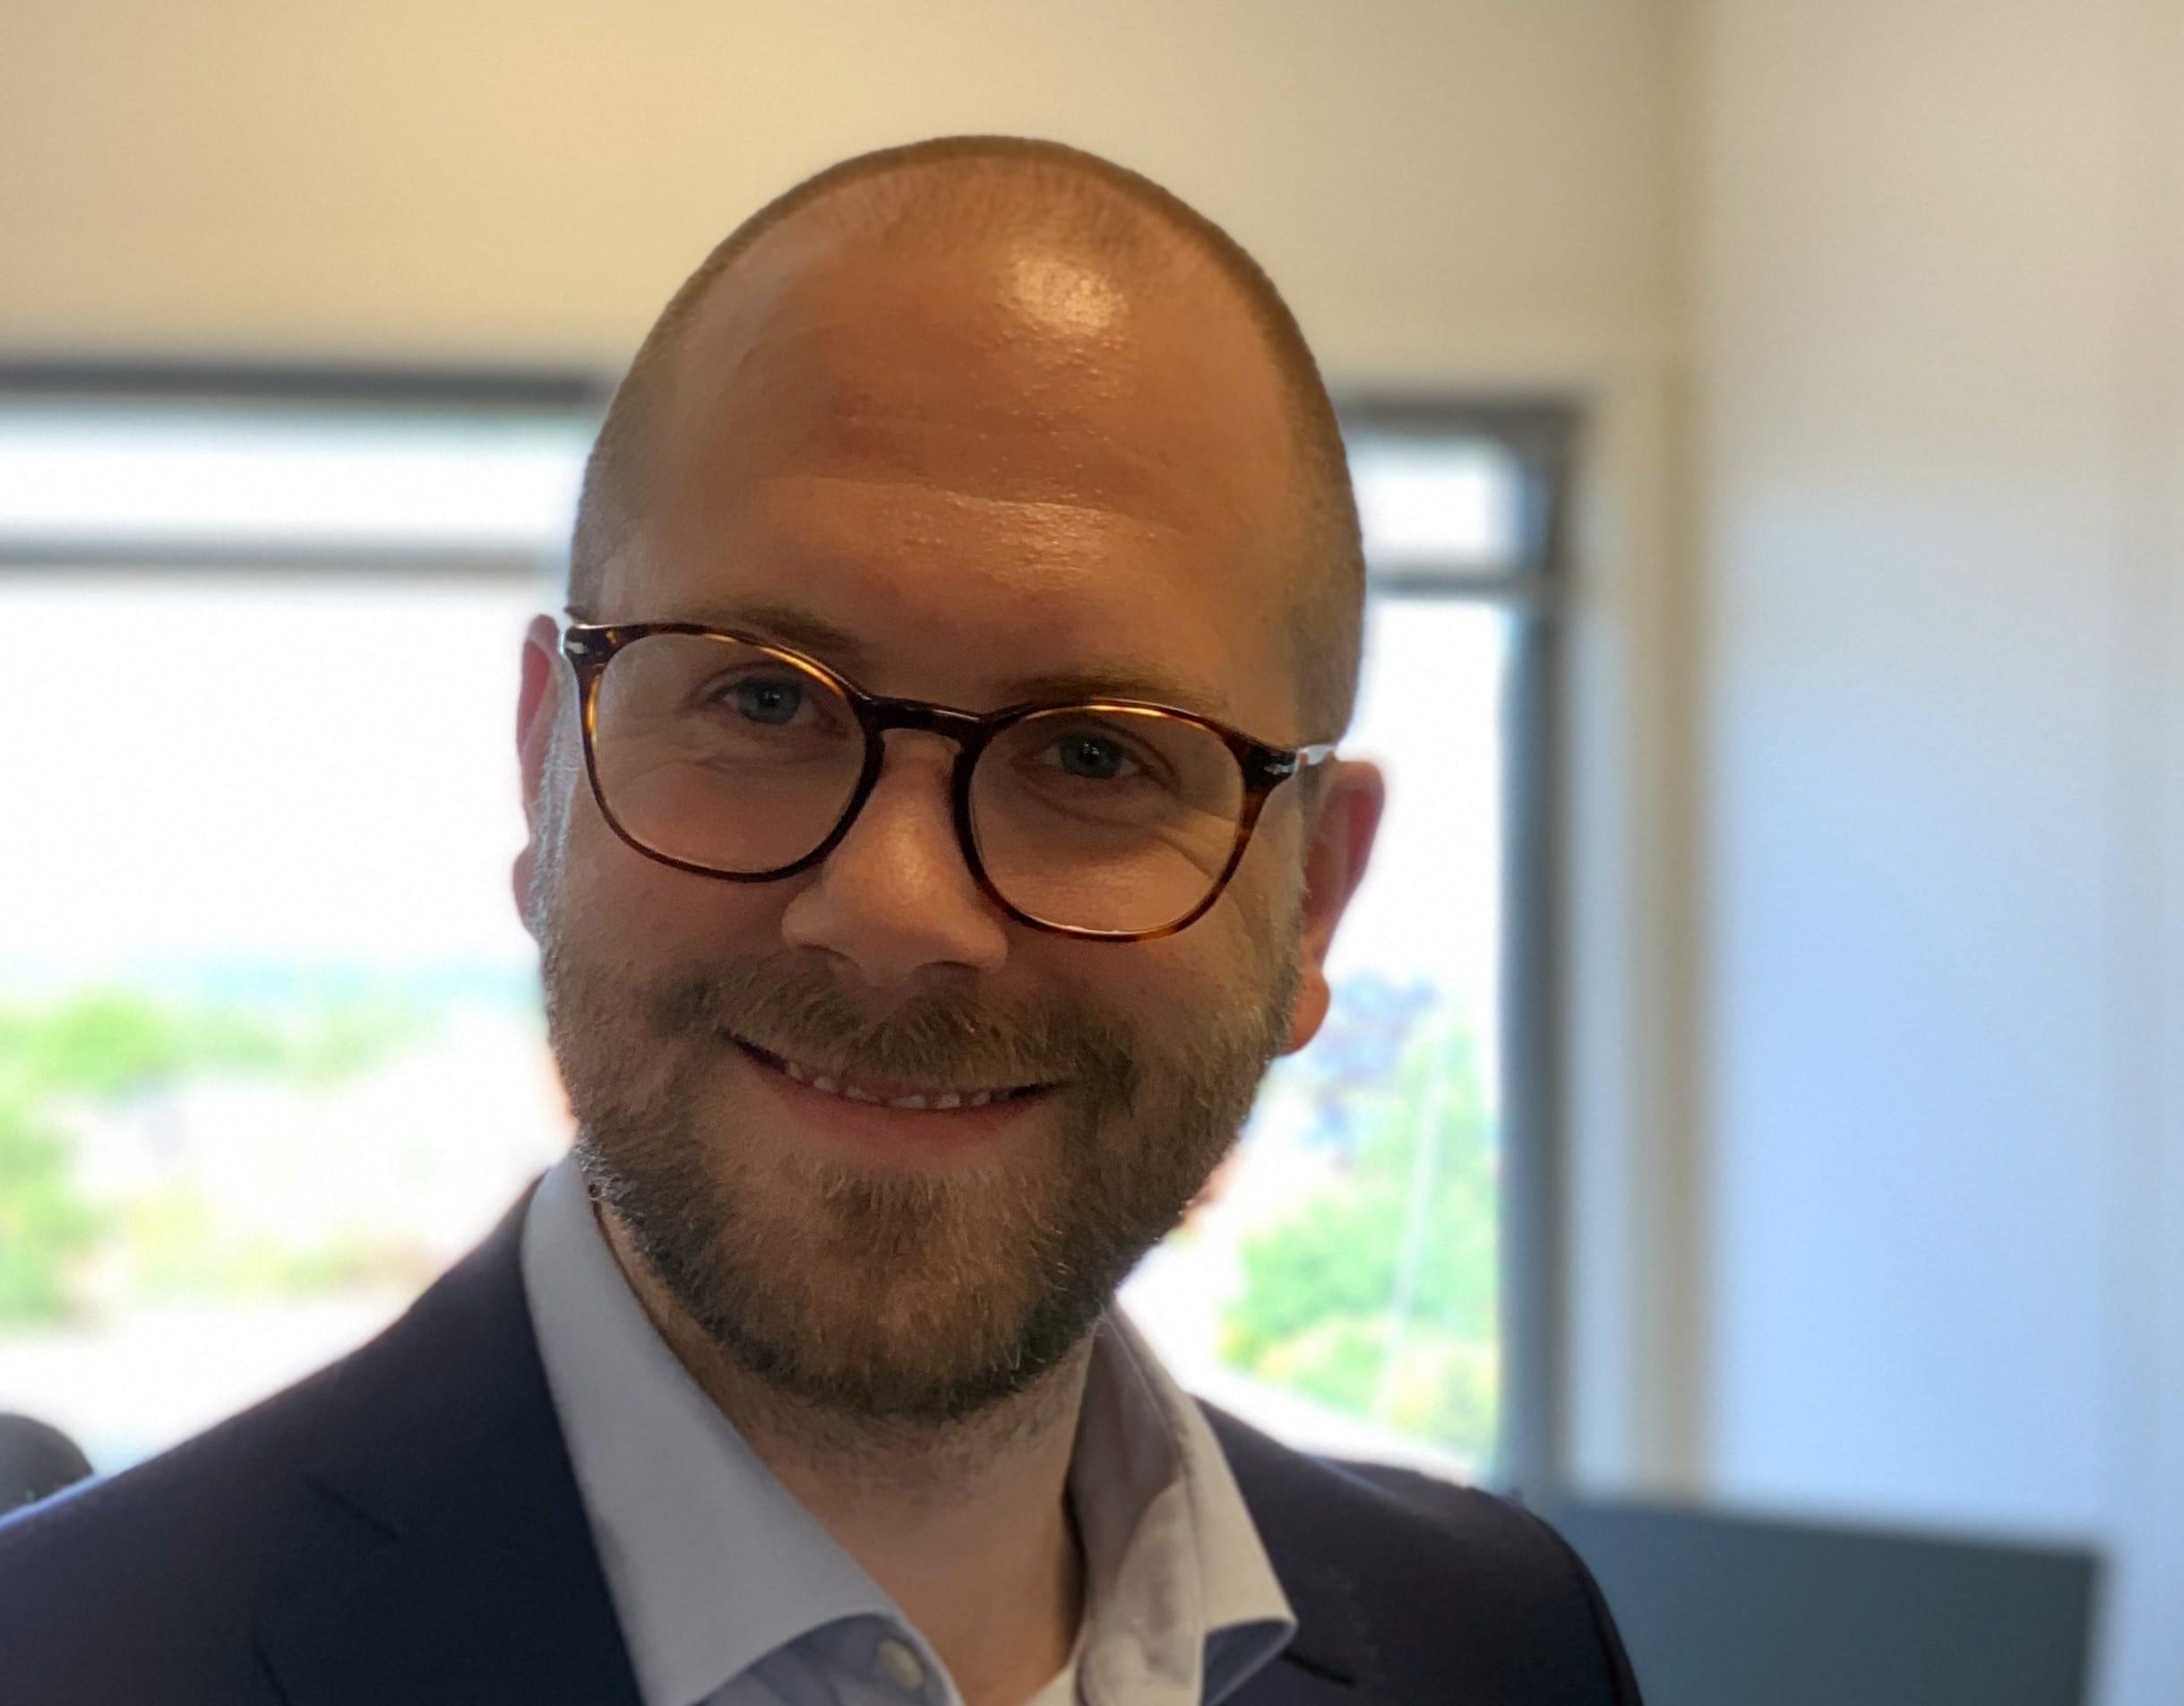 Sales Director Steffen Pettersen